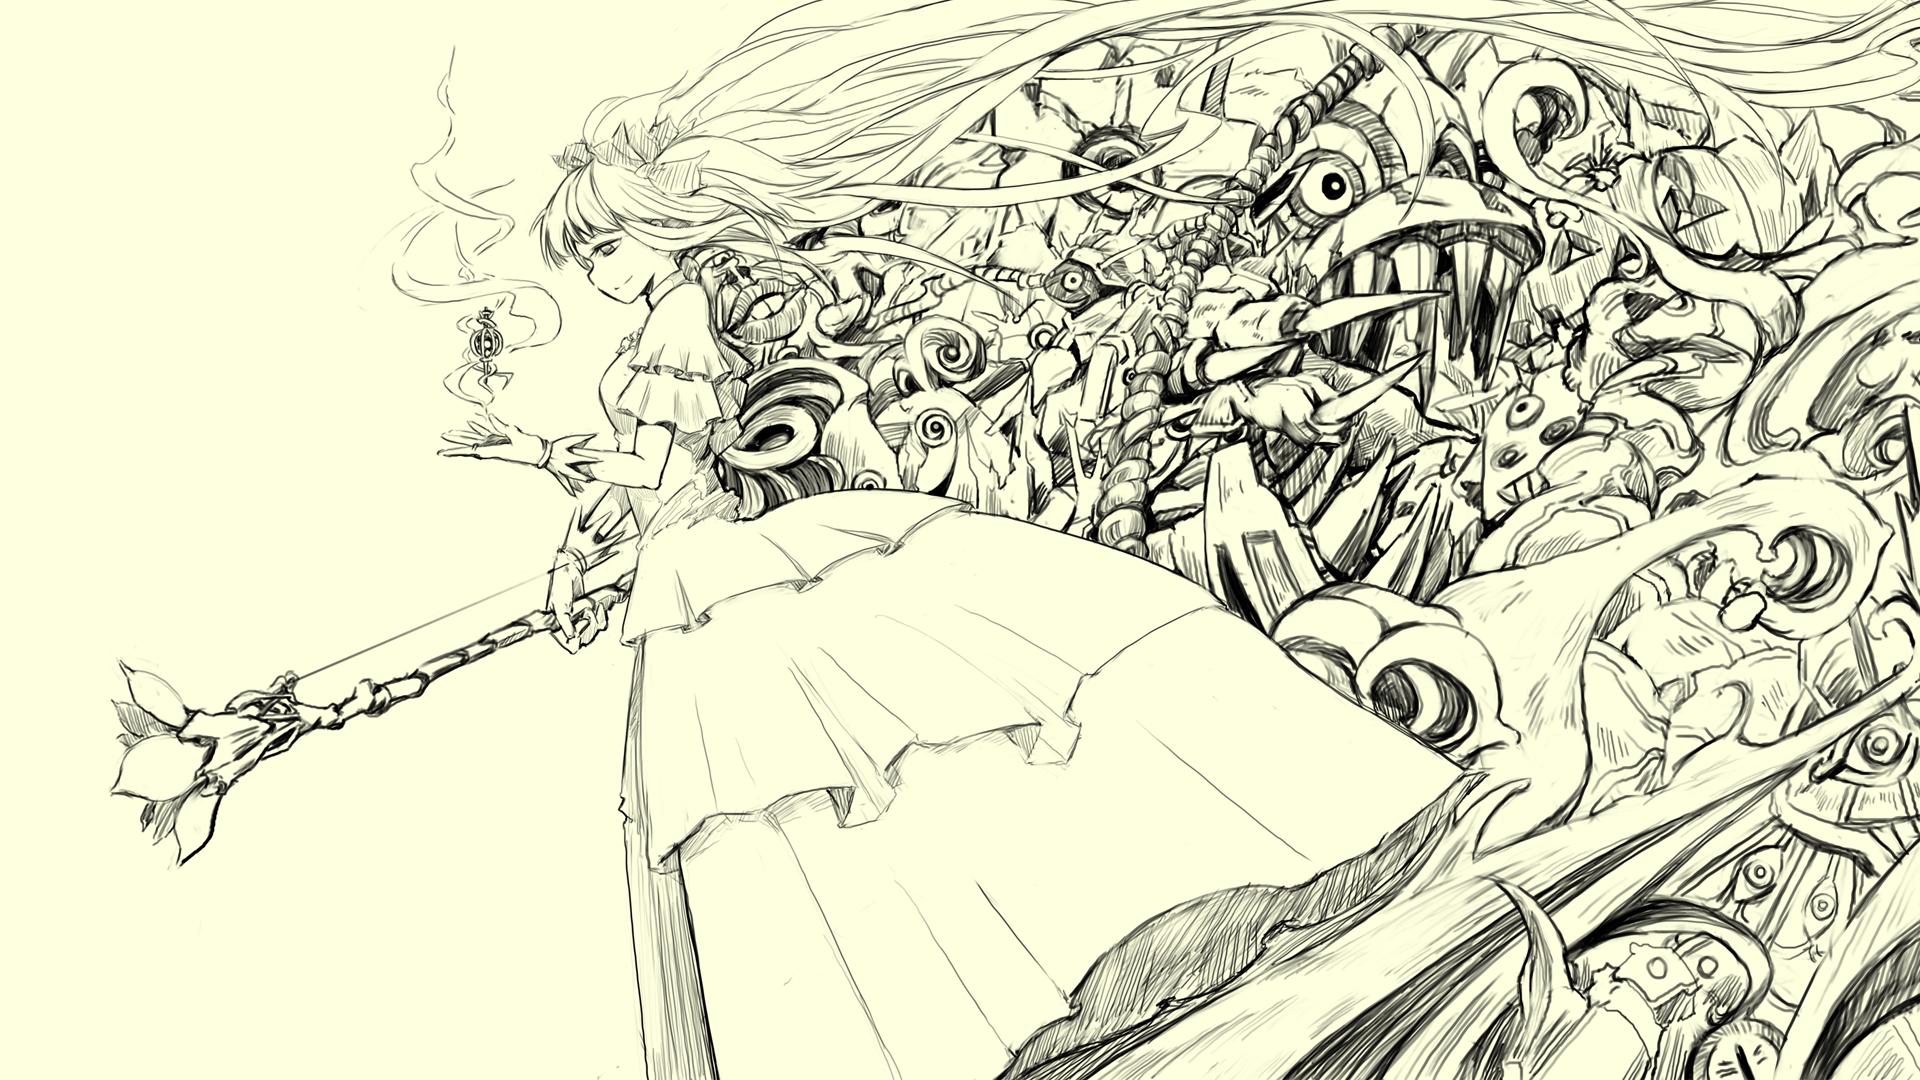 1920x1080 Anime Sketches Anime Girl Sketch Google Skins, Anime Girl Sketch